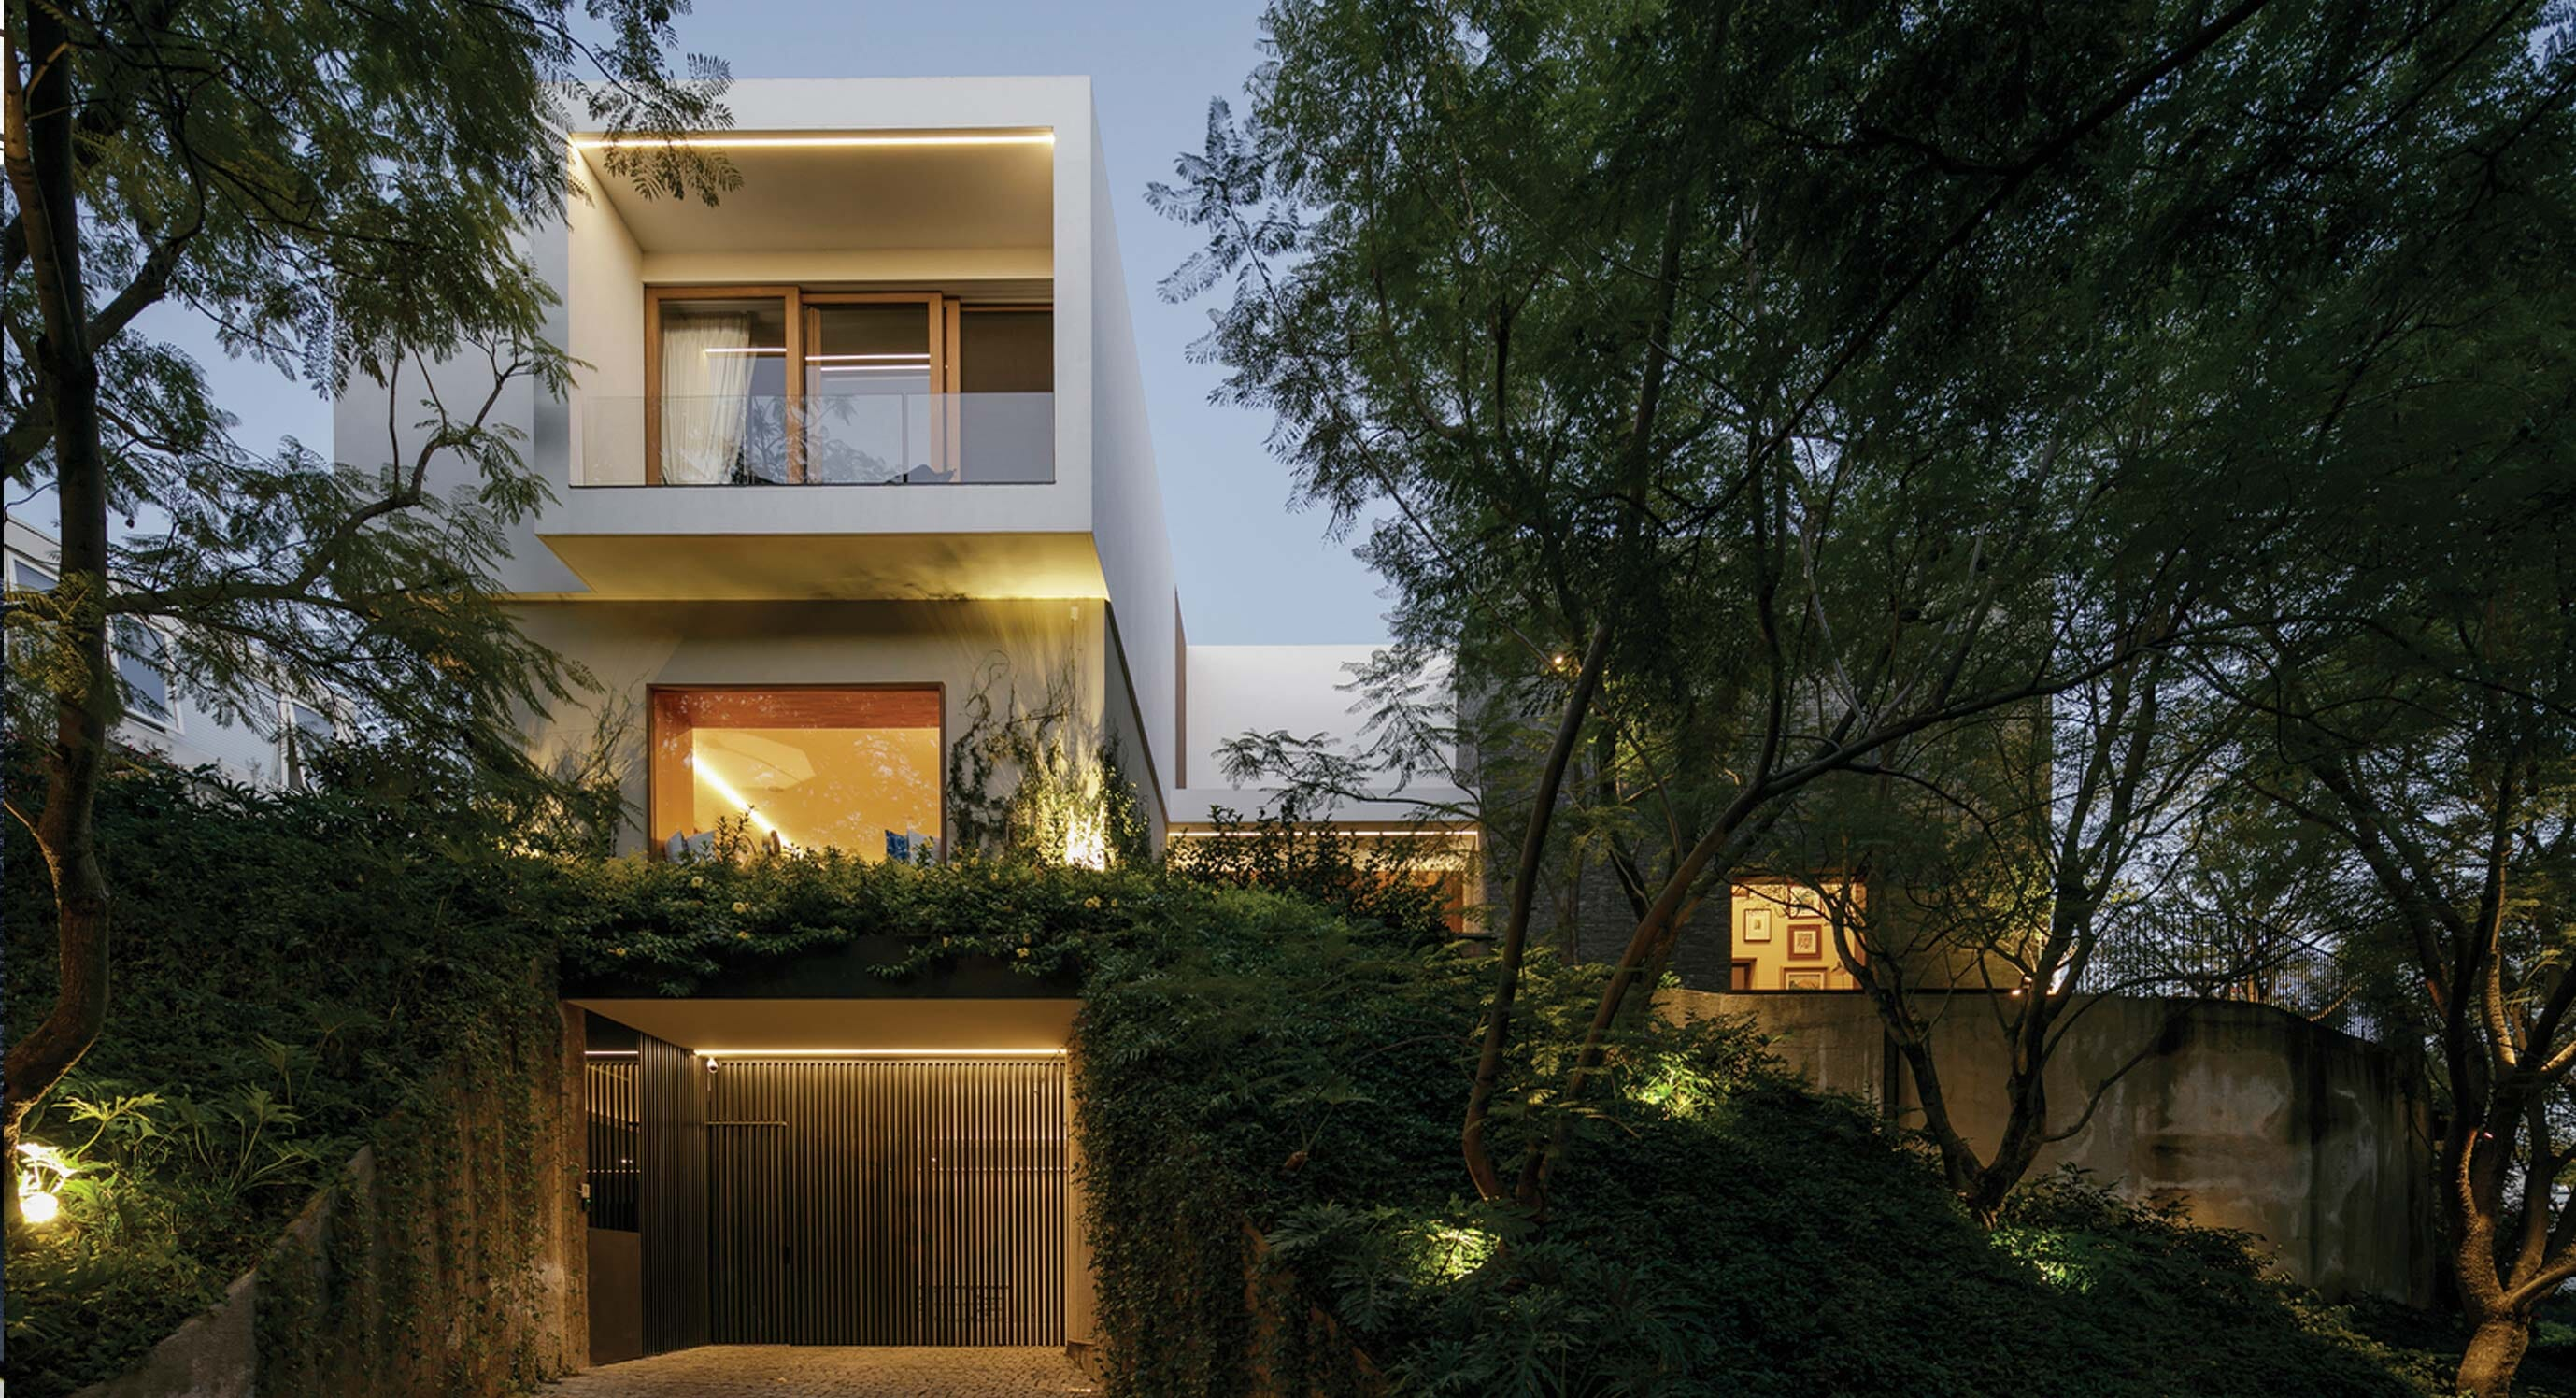 Laidback Living: LJ30 House By CDM Casas de México